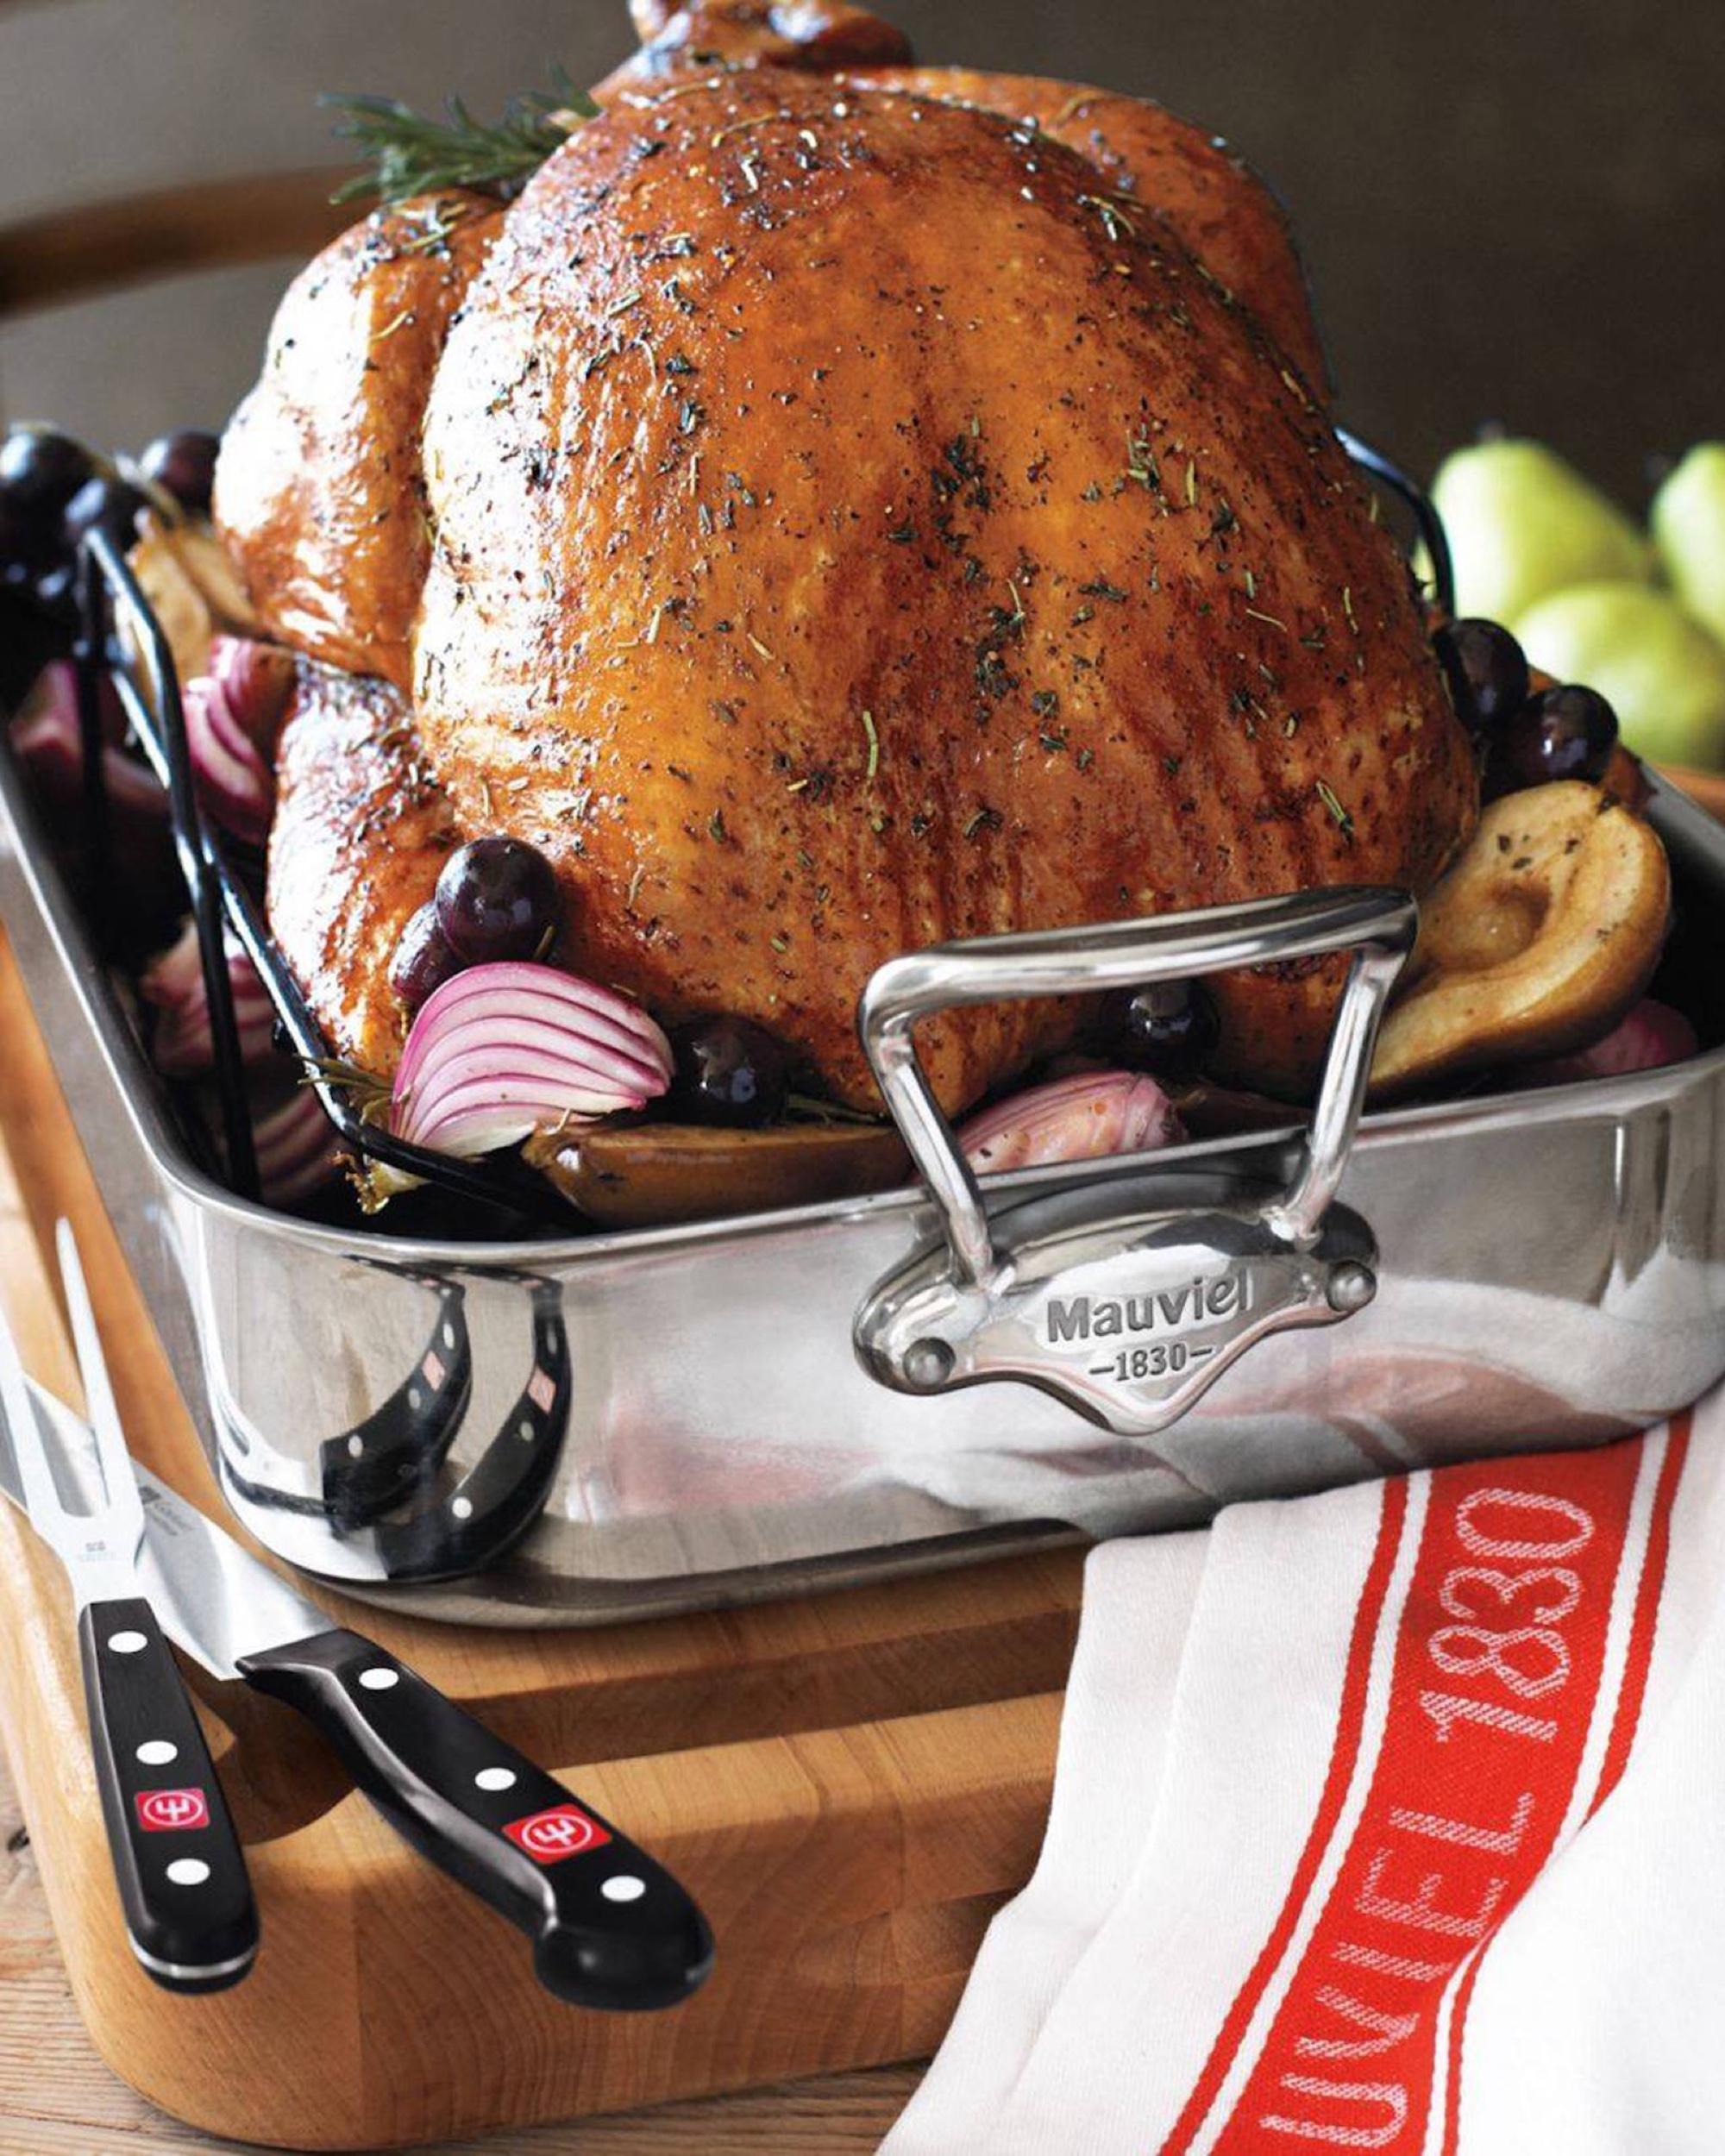 mauviel-roasting-pan-rack-0815